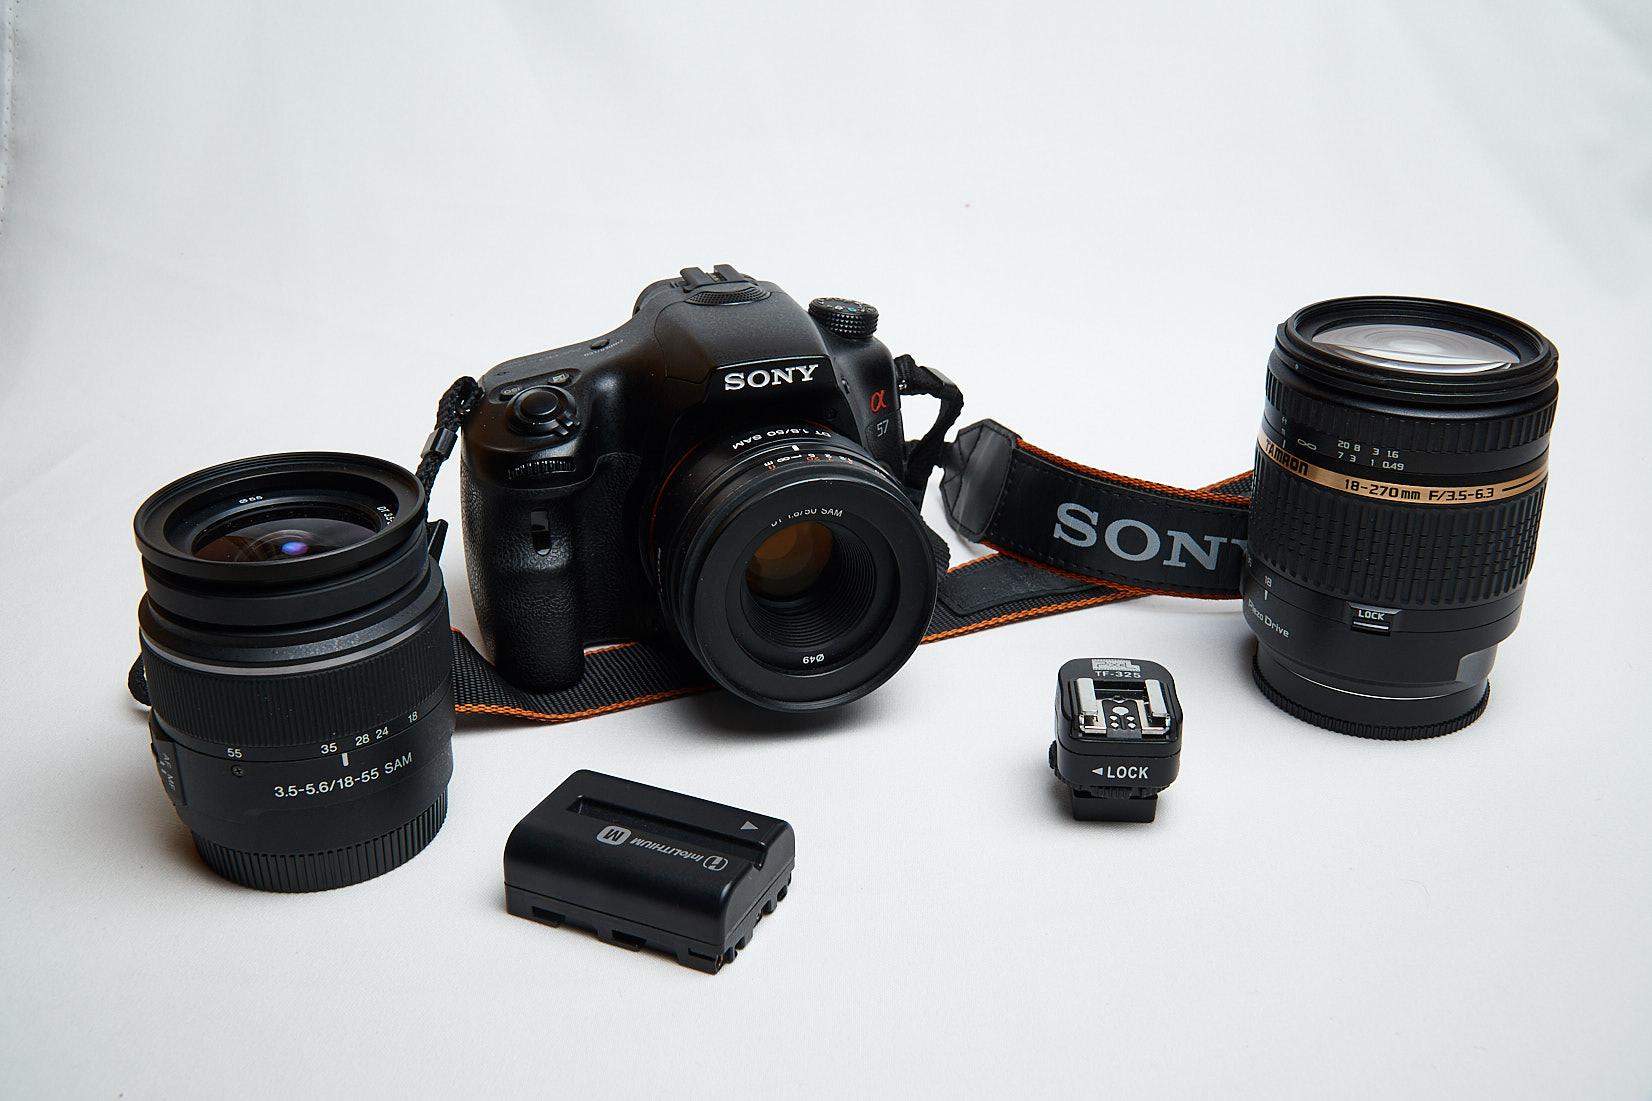 Sony-Alpha 57-Tamron 18-270-Blitzadapter-SAL 50mm f1.8